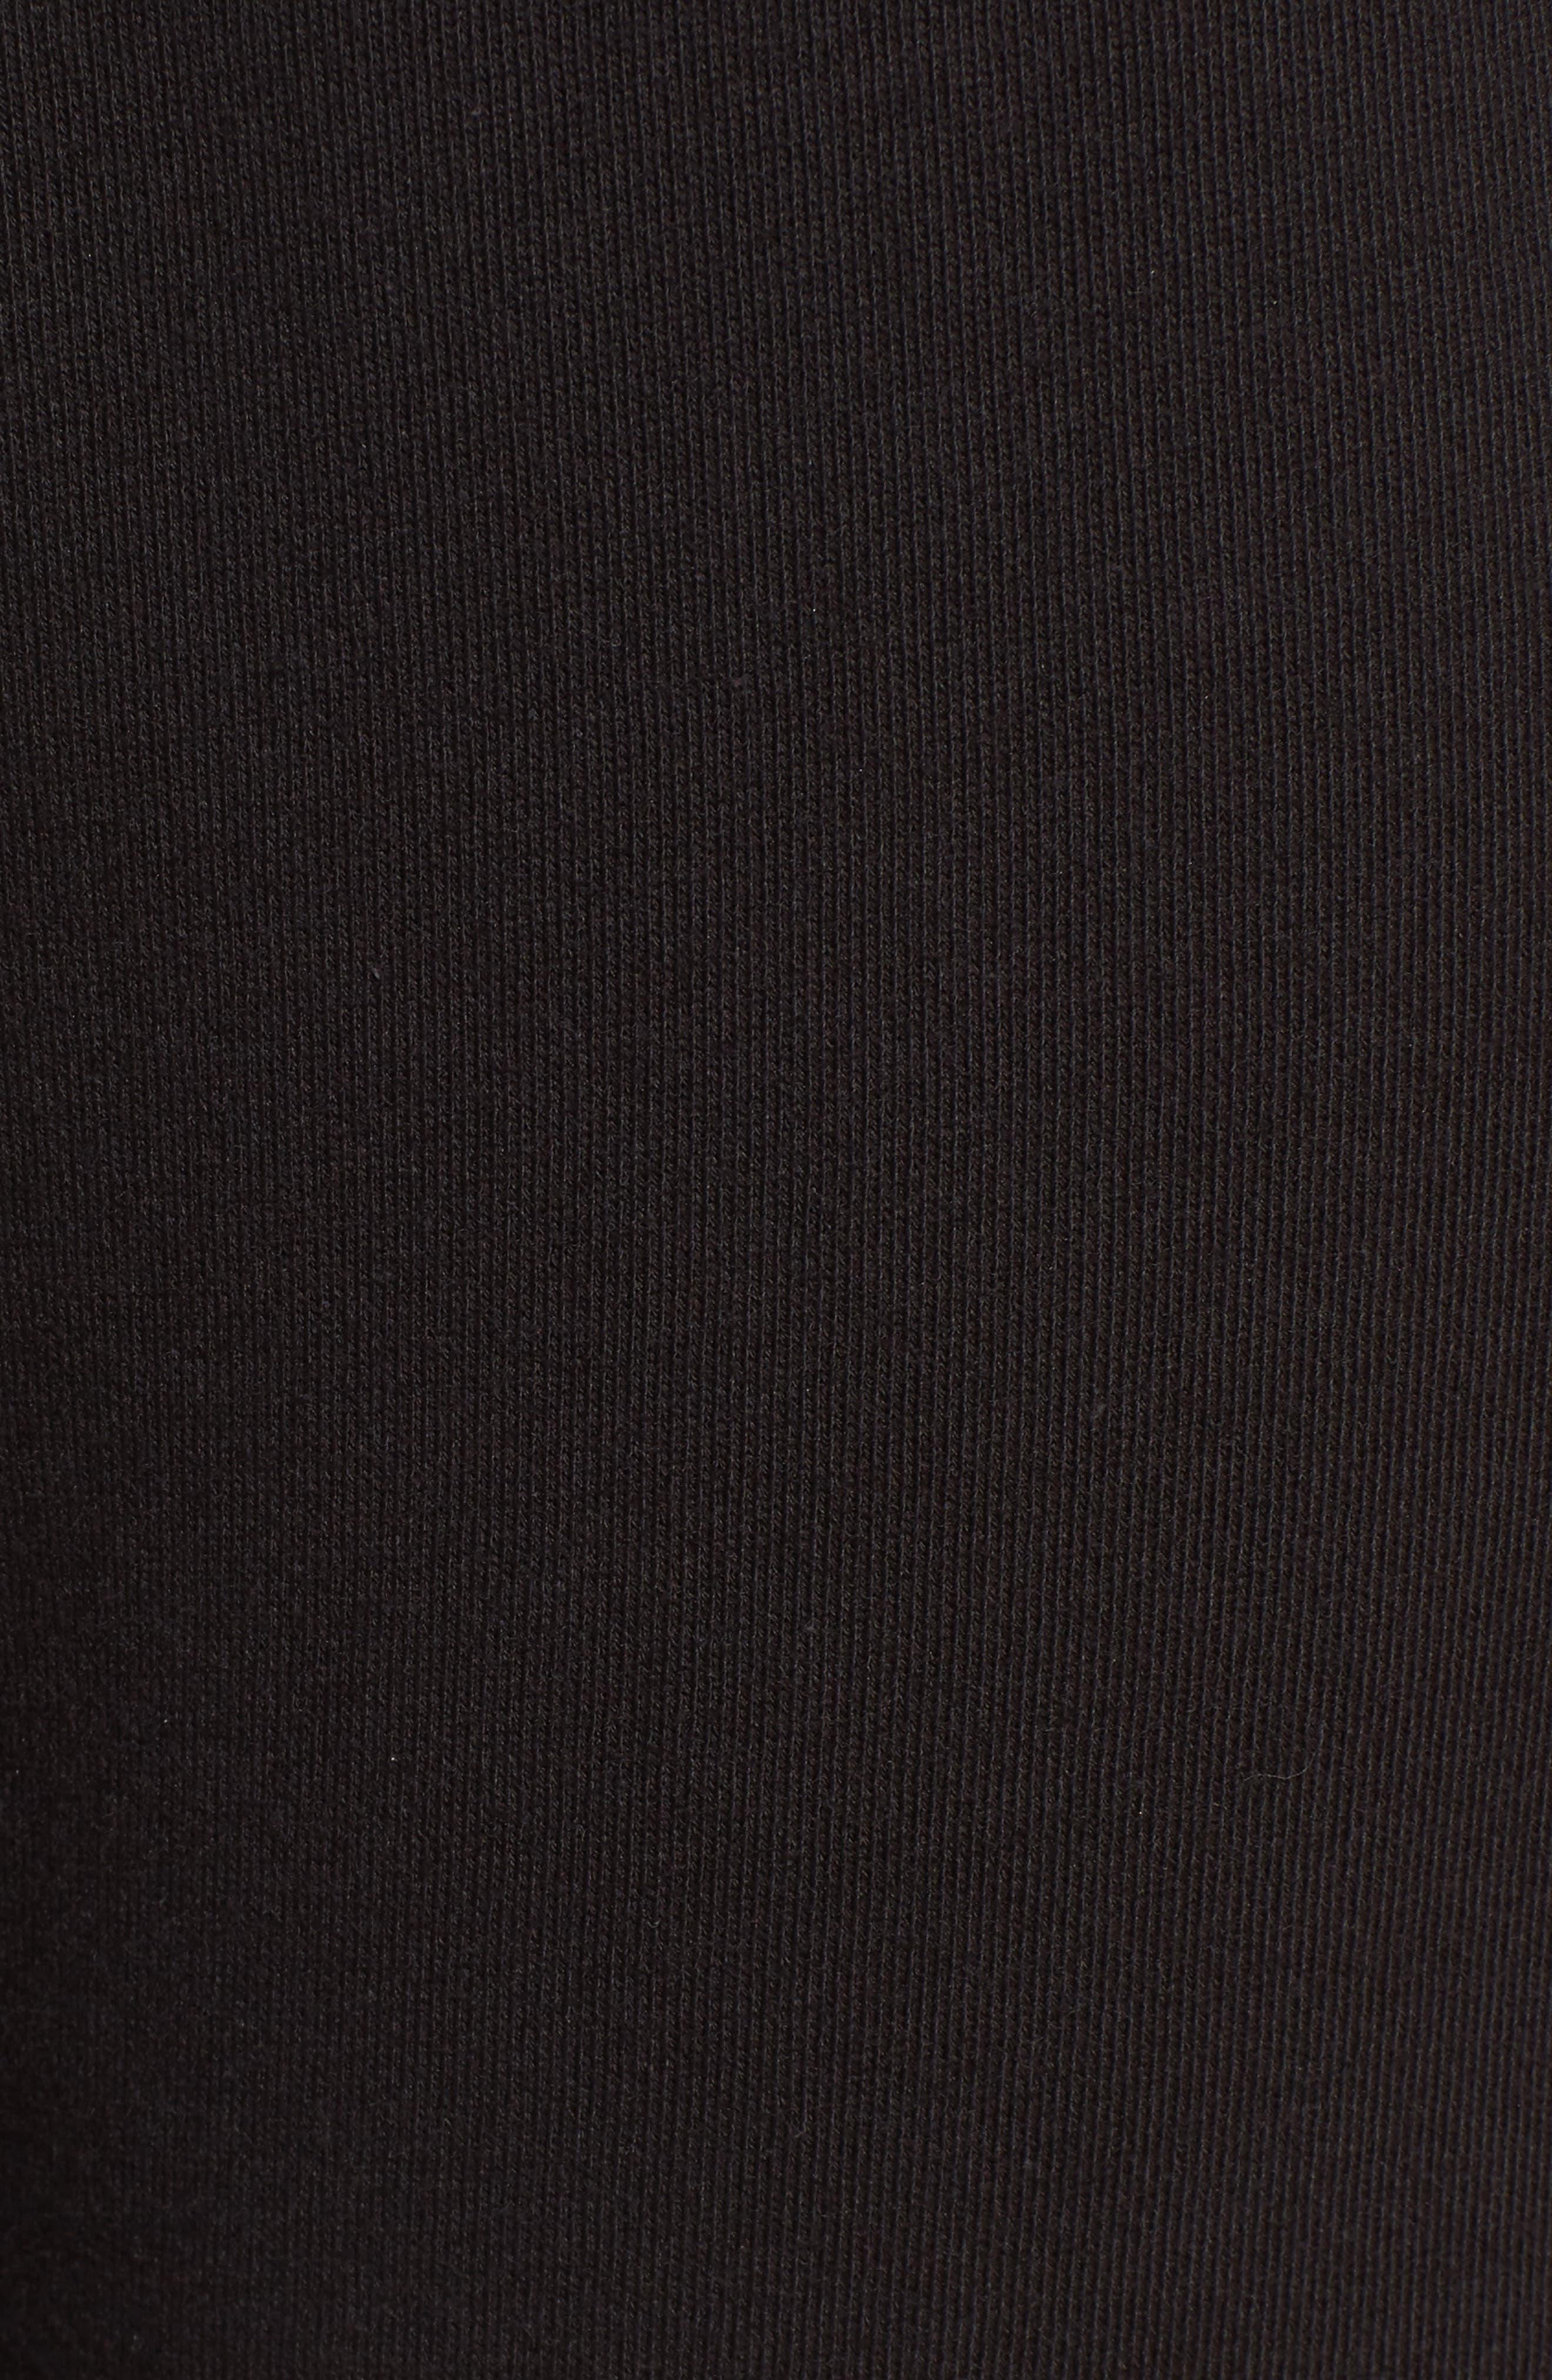 Vol Tower Sweatpants,                             Alternate thumbnail 5, color,                             001